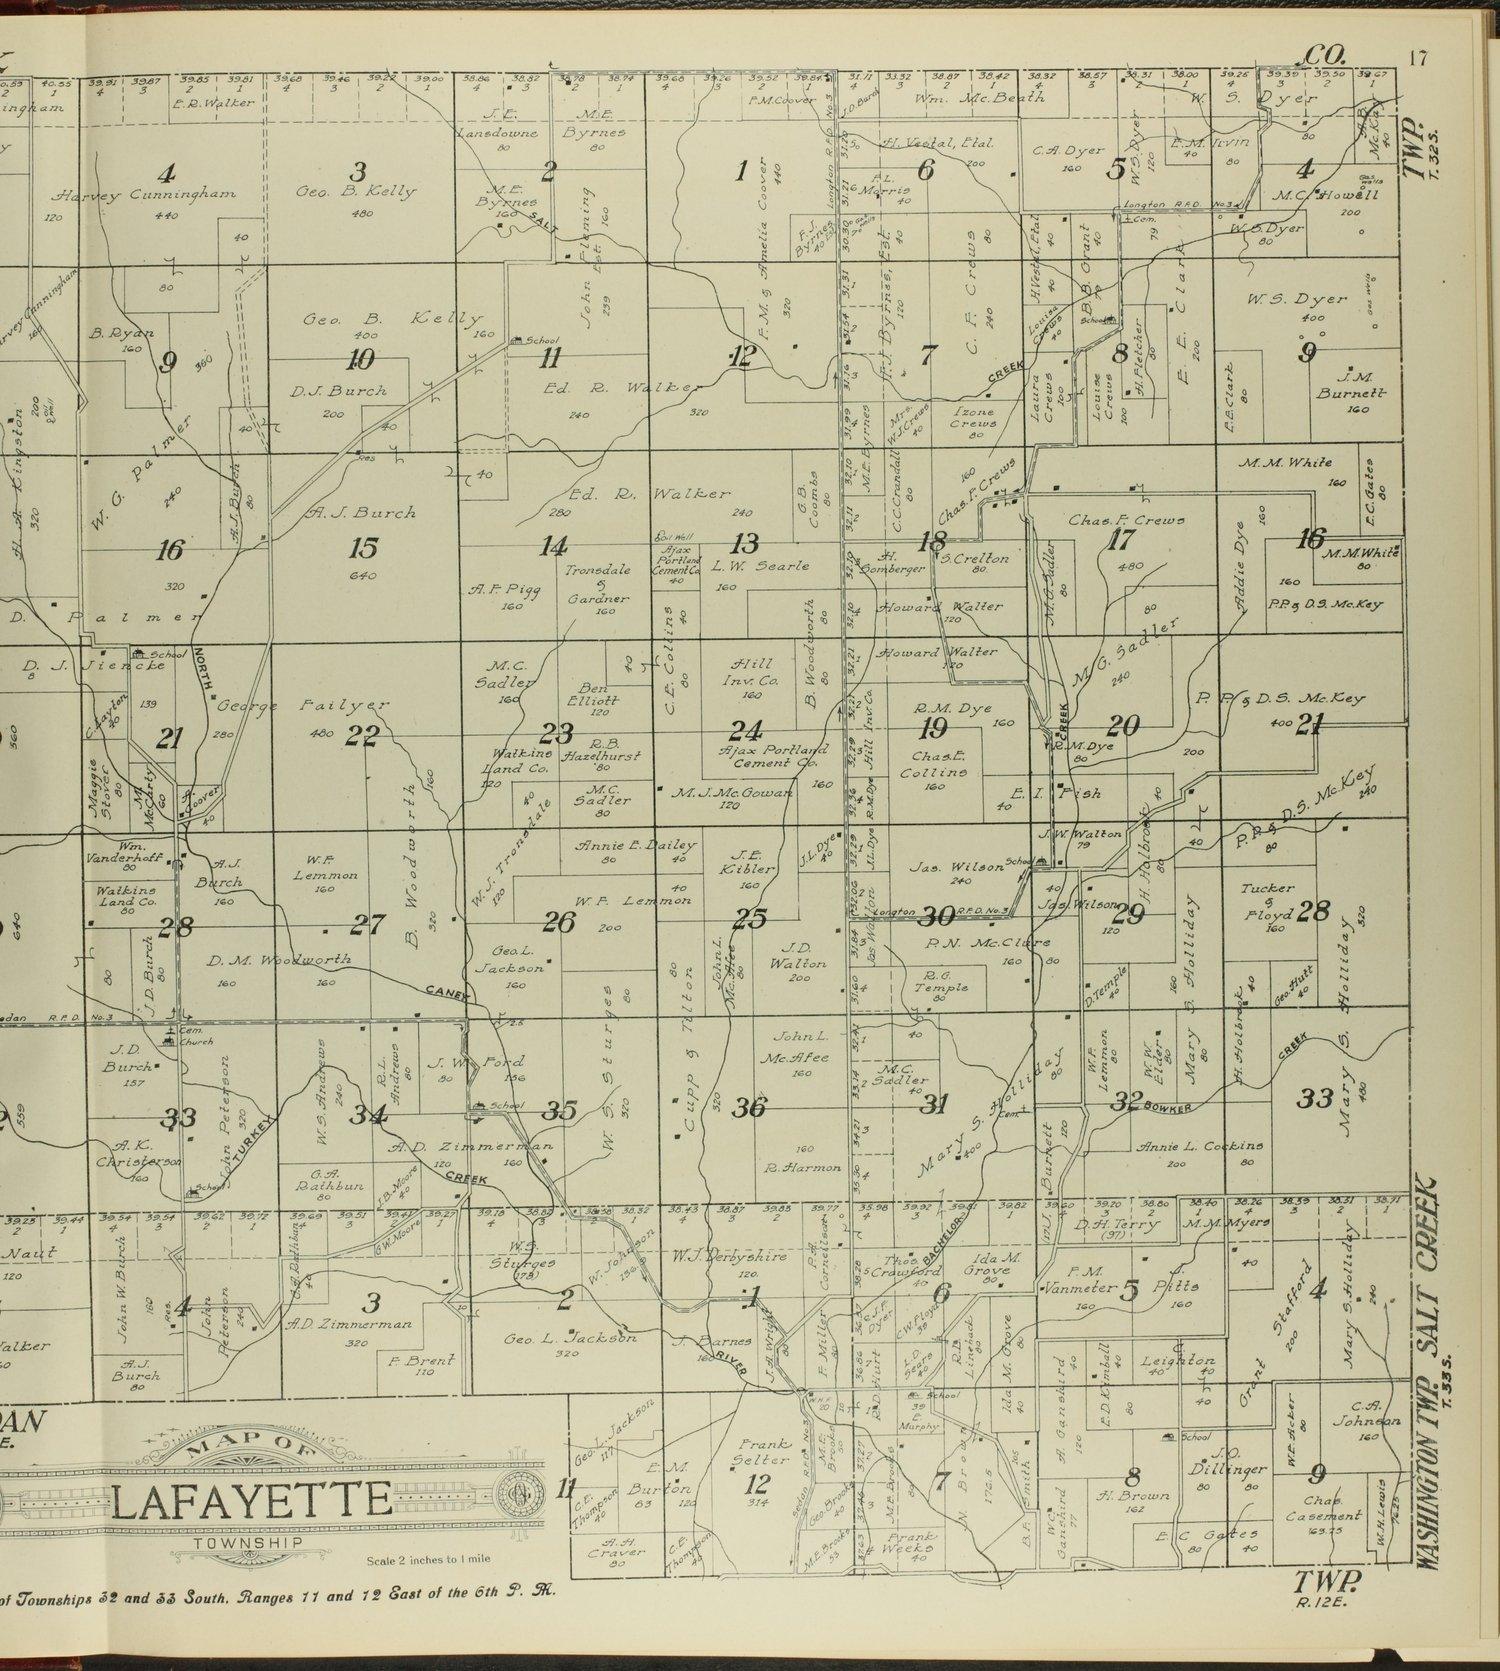 Standard atlas of Chautauqua County, Kansas - 17